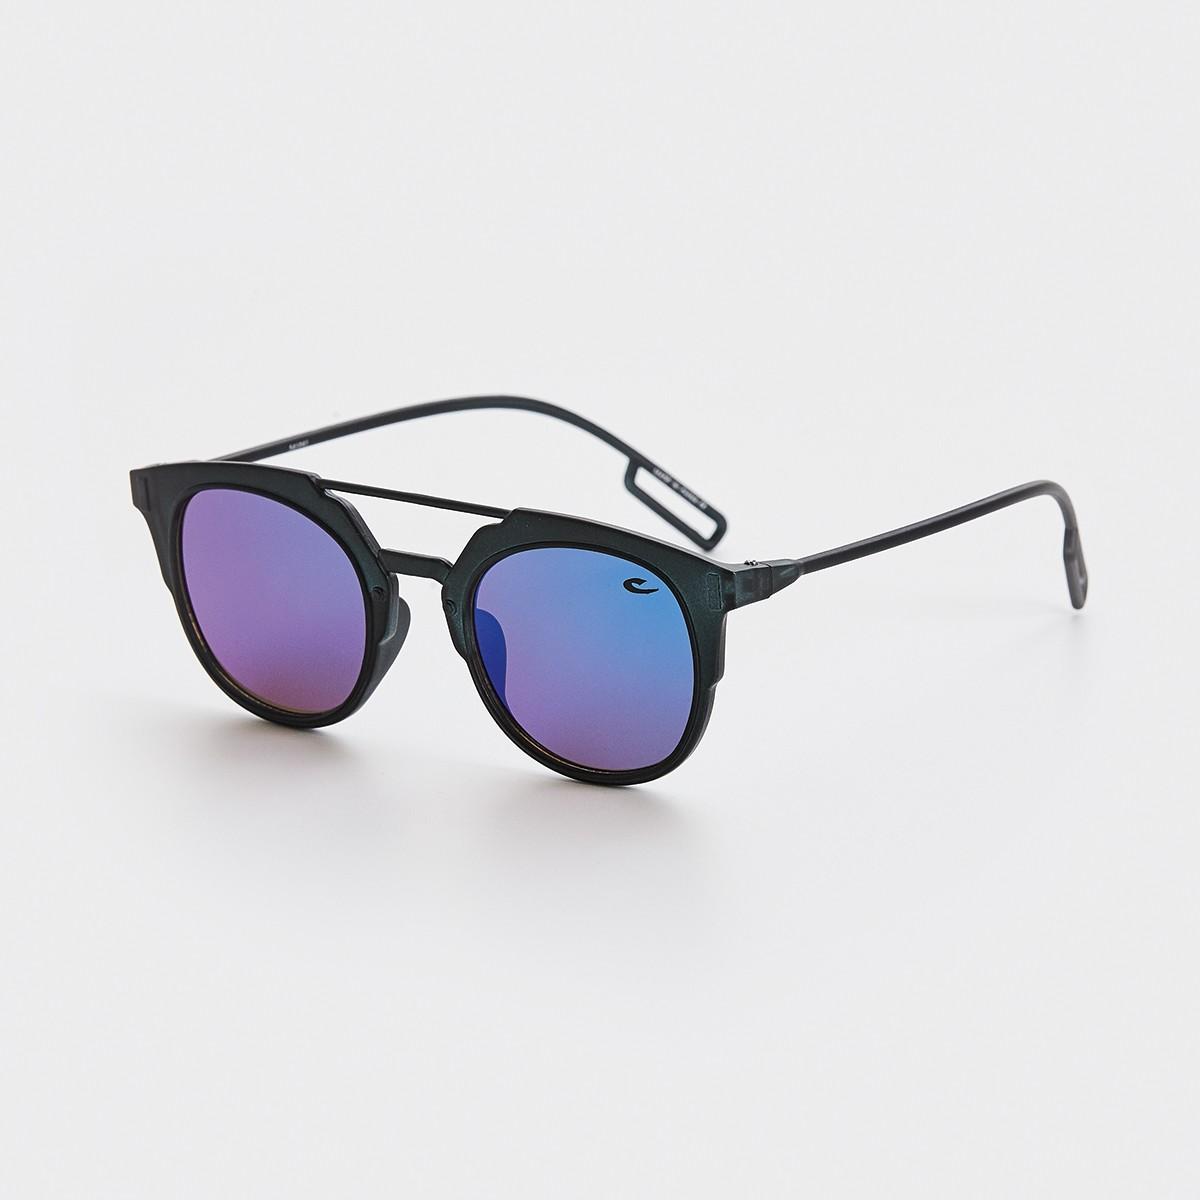 74e25b6d4e6d5 Óculos de Sol Slim Azul CAJUBRASIL Activewear